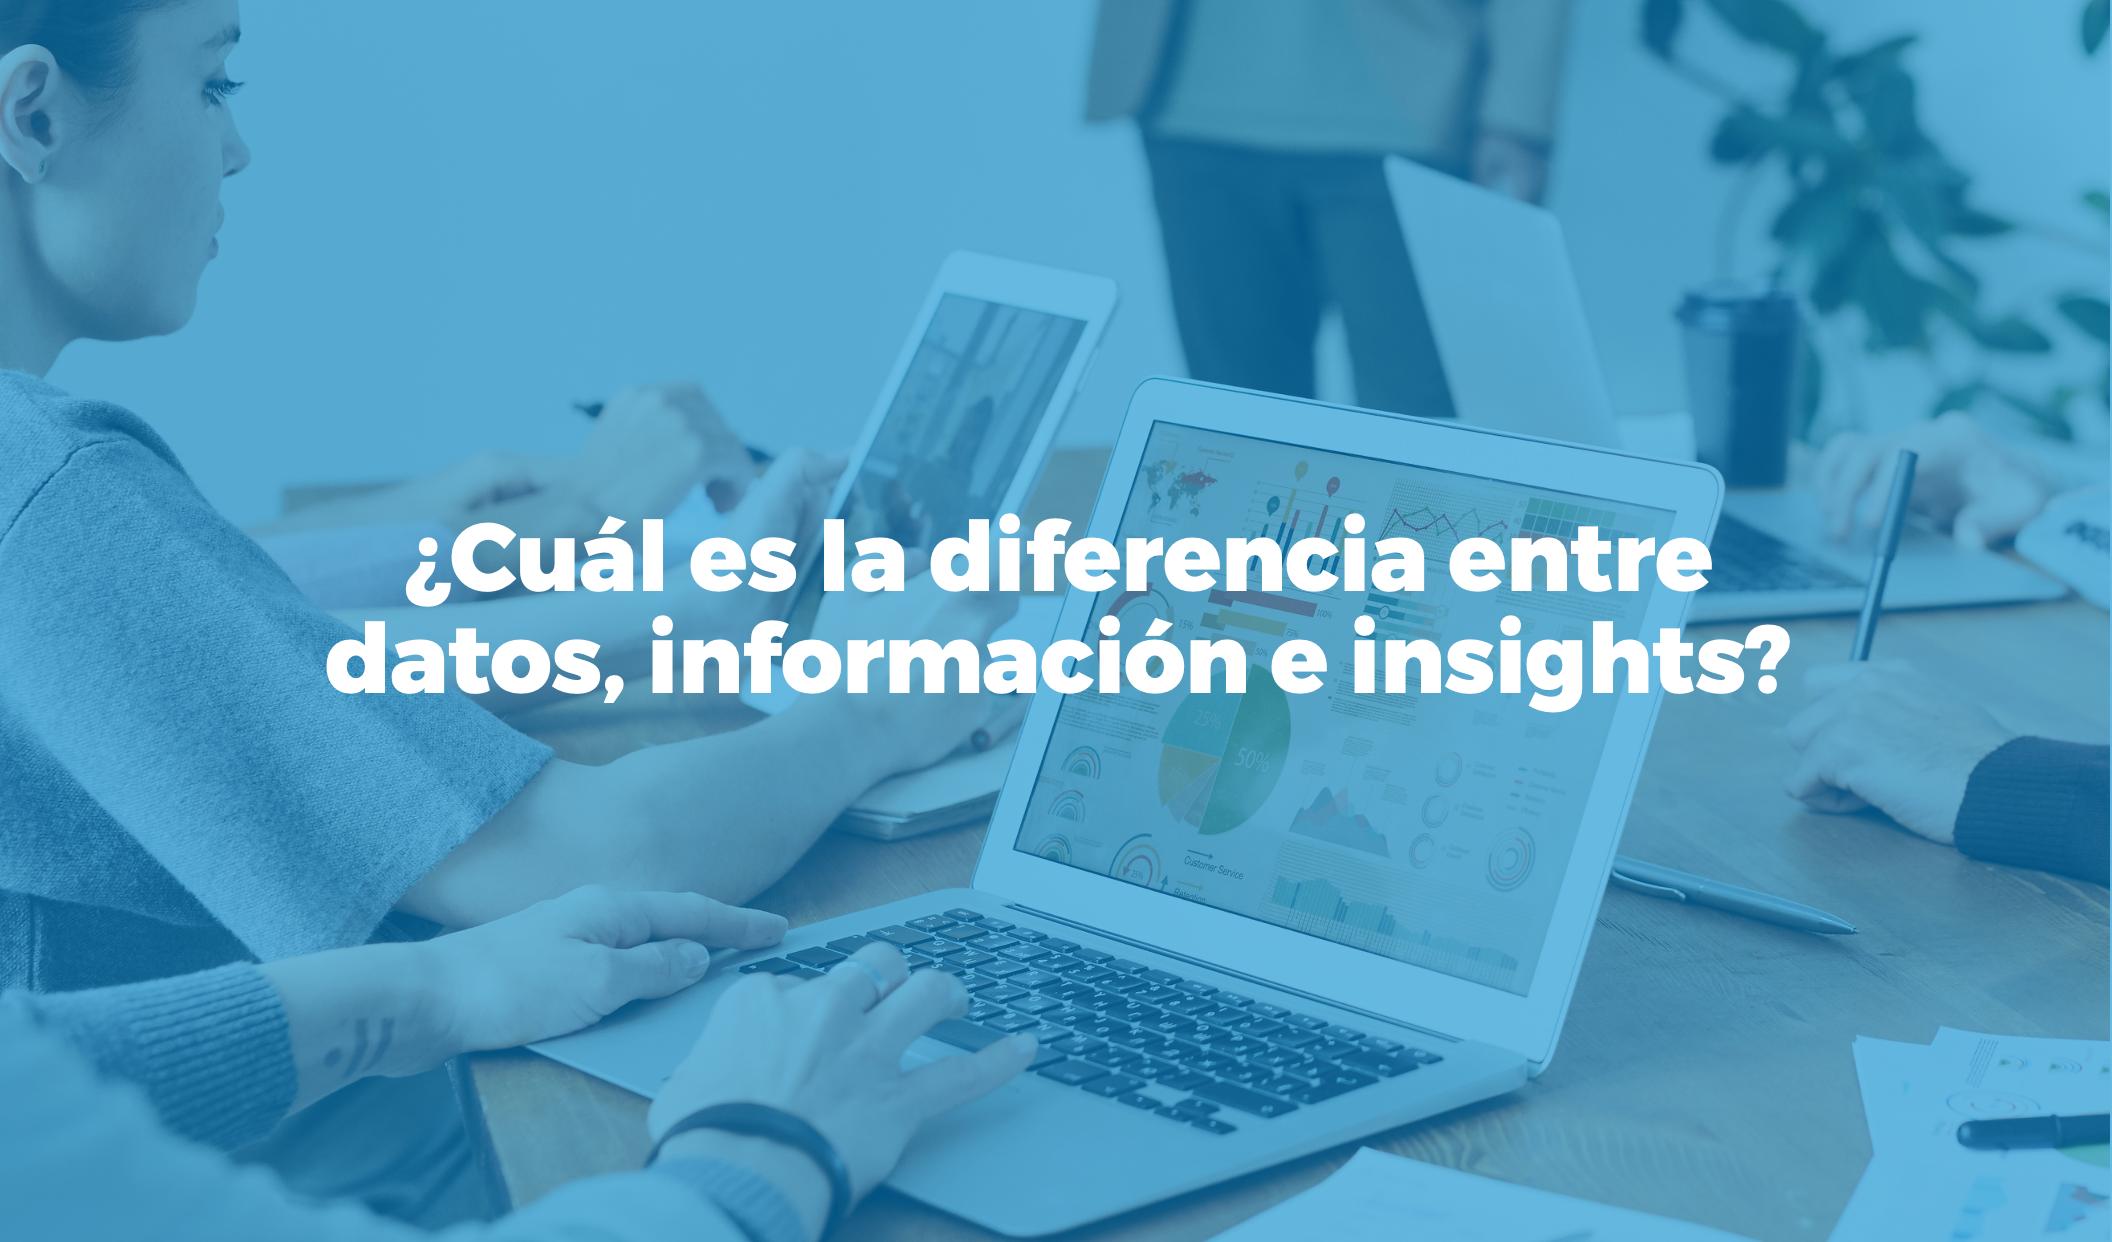 Bismart diferencia entre datos informacion insights